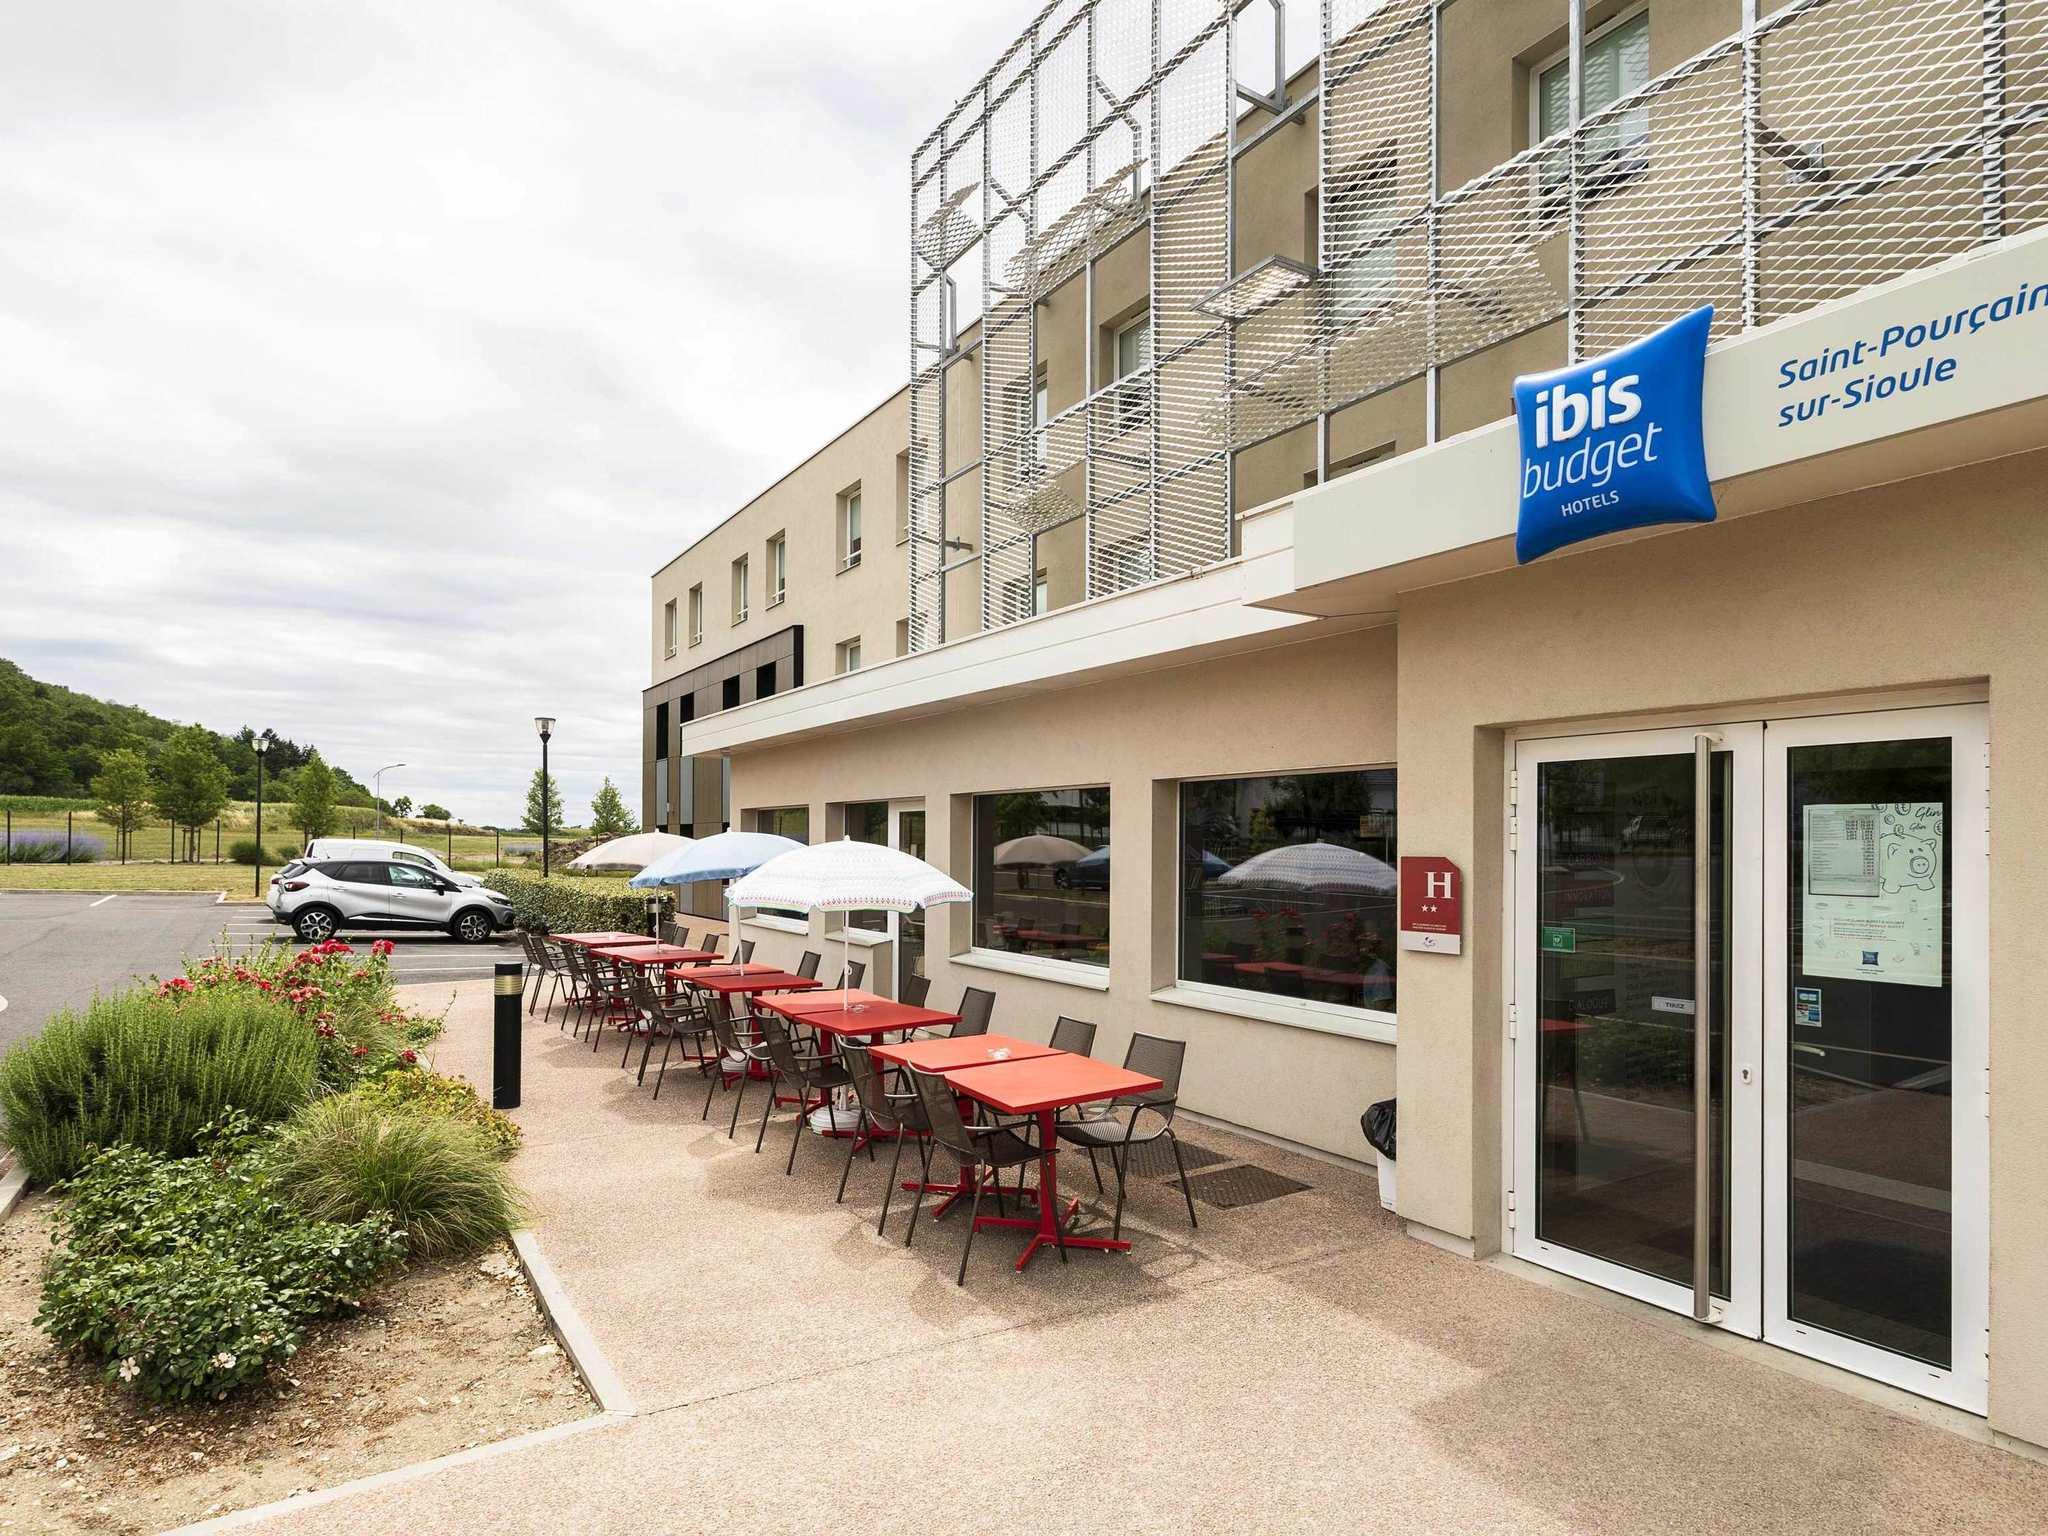 酒店 – ibis budget Saint-Pourçain-sur-Sioule